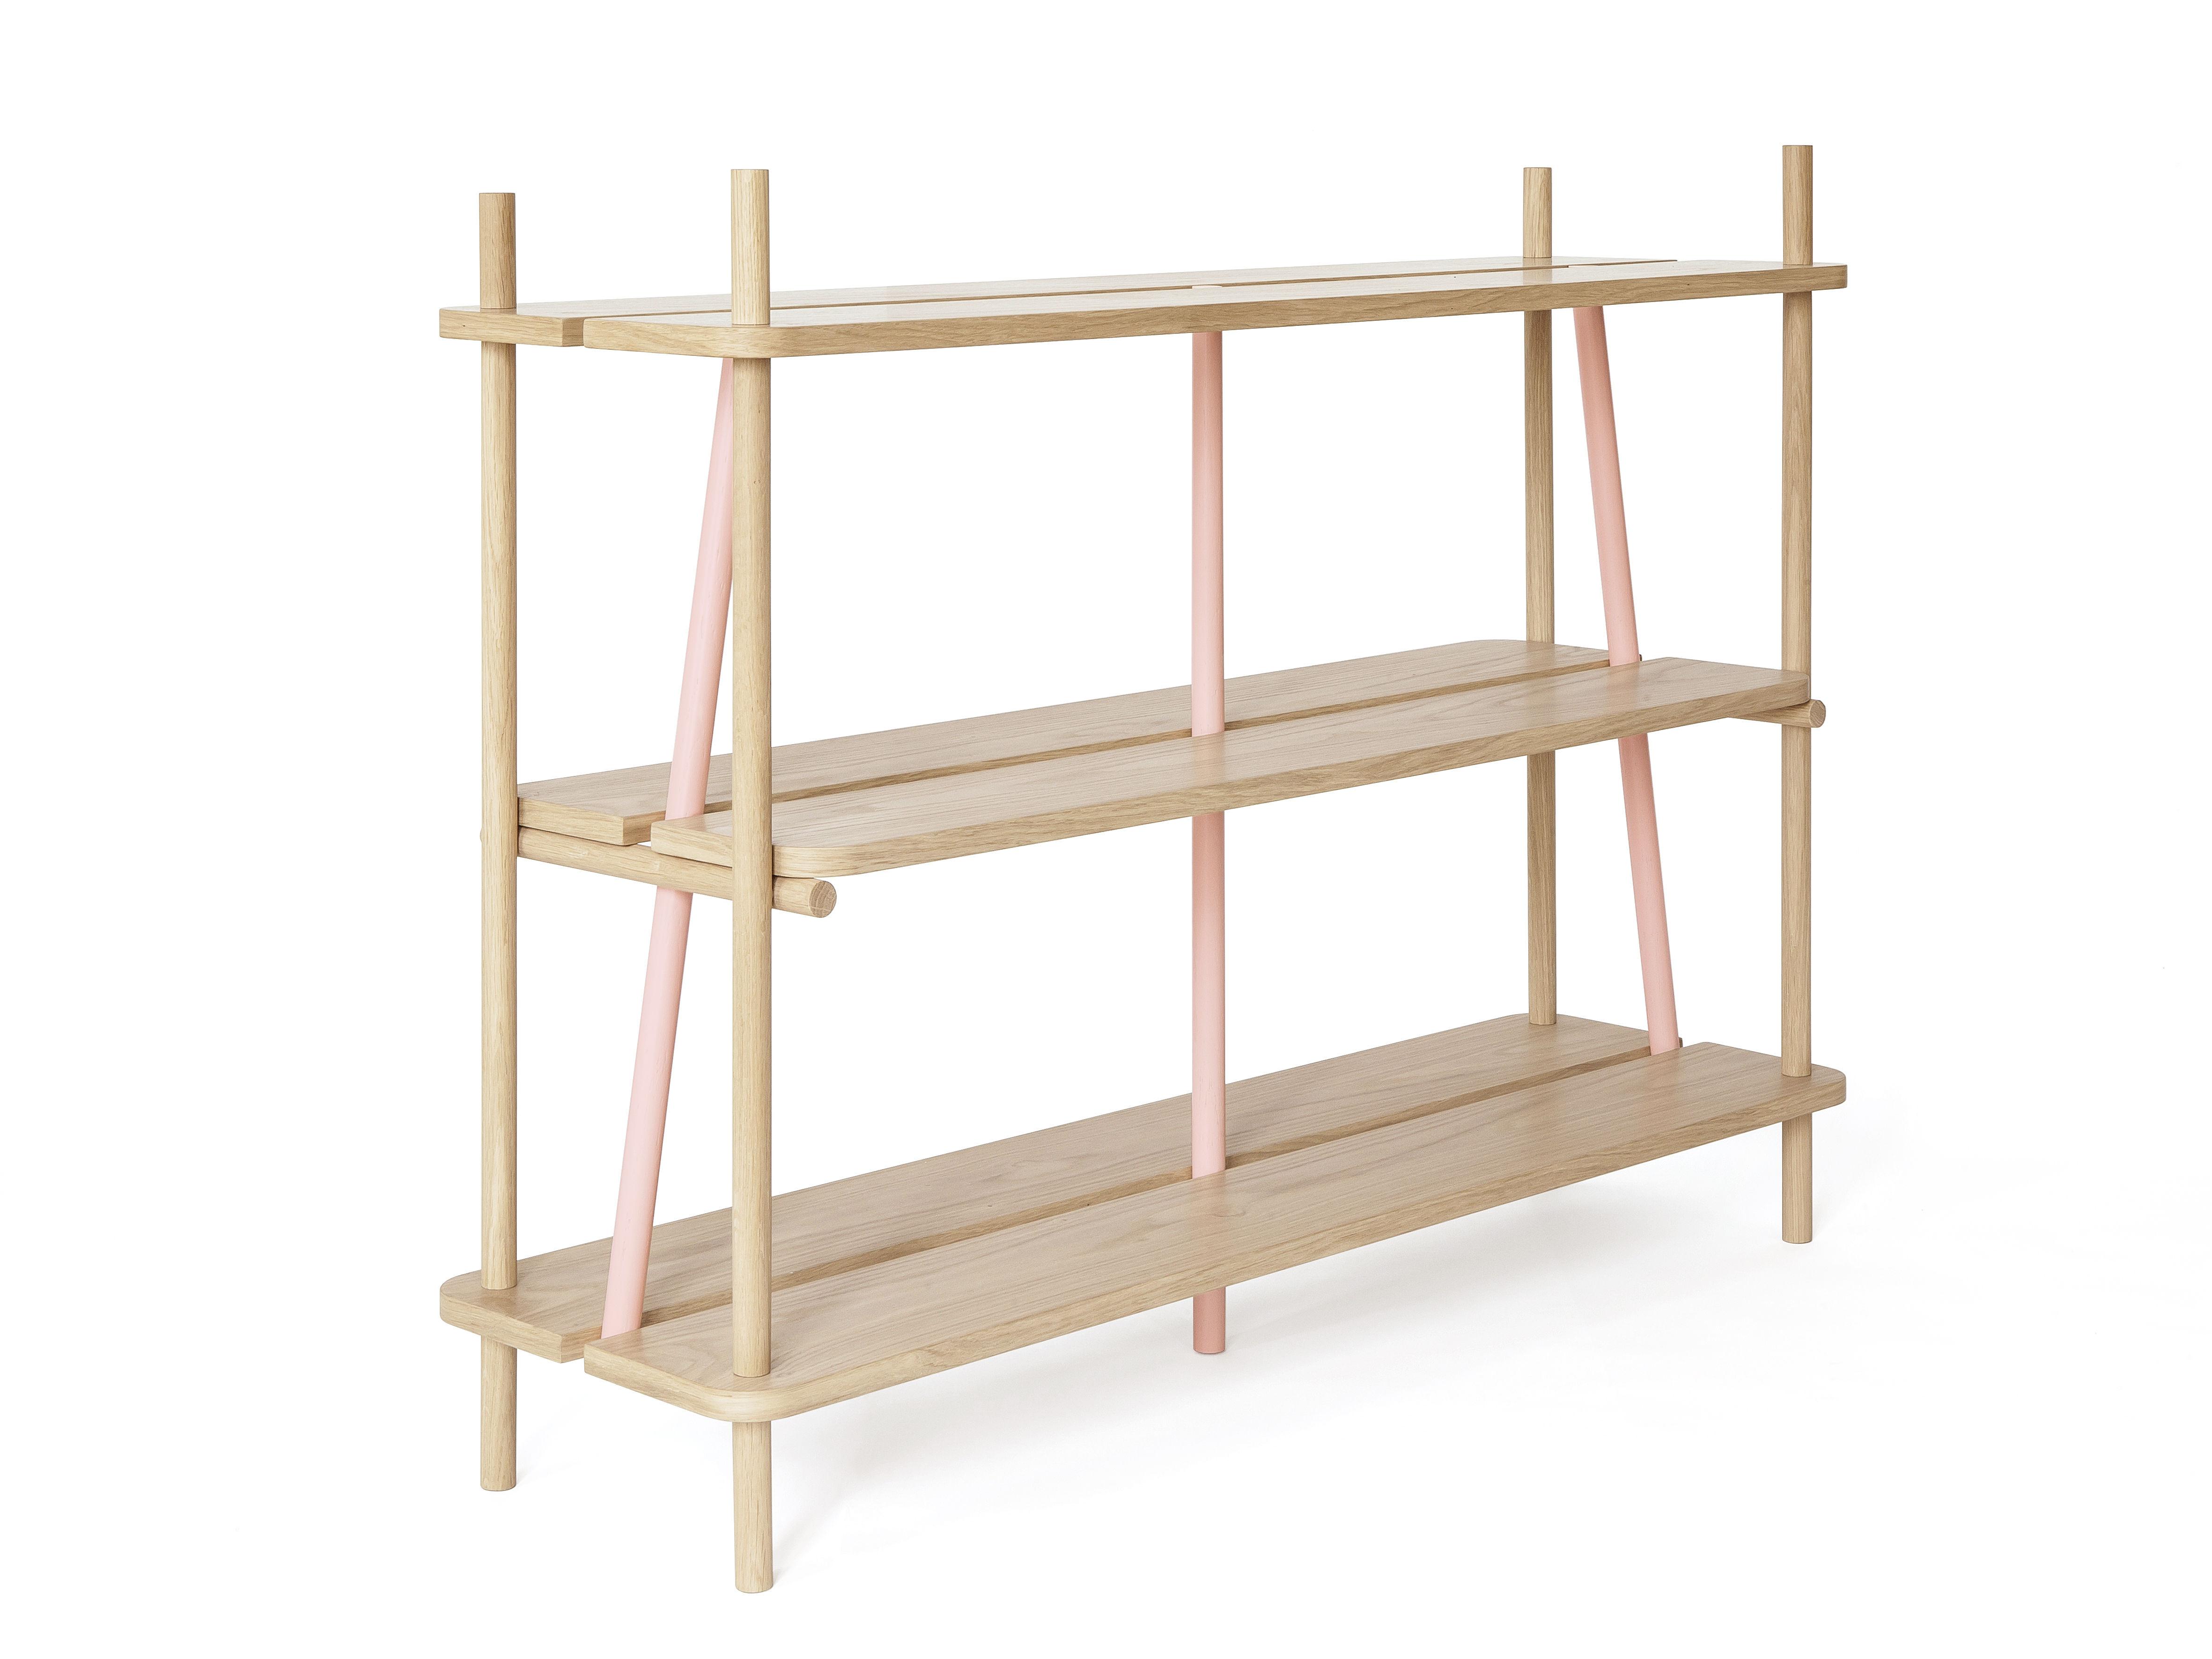 etag re simone l 120 x h 92 cm ch ne montants roses hart made in design. Black Bedroom Furniture Sets. Home Design Ideas